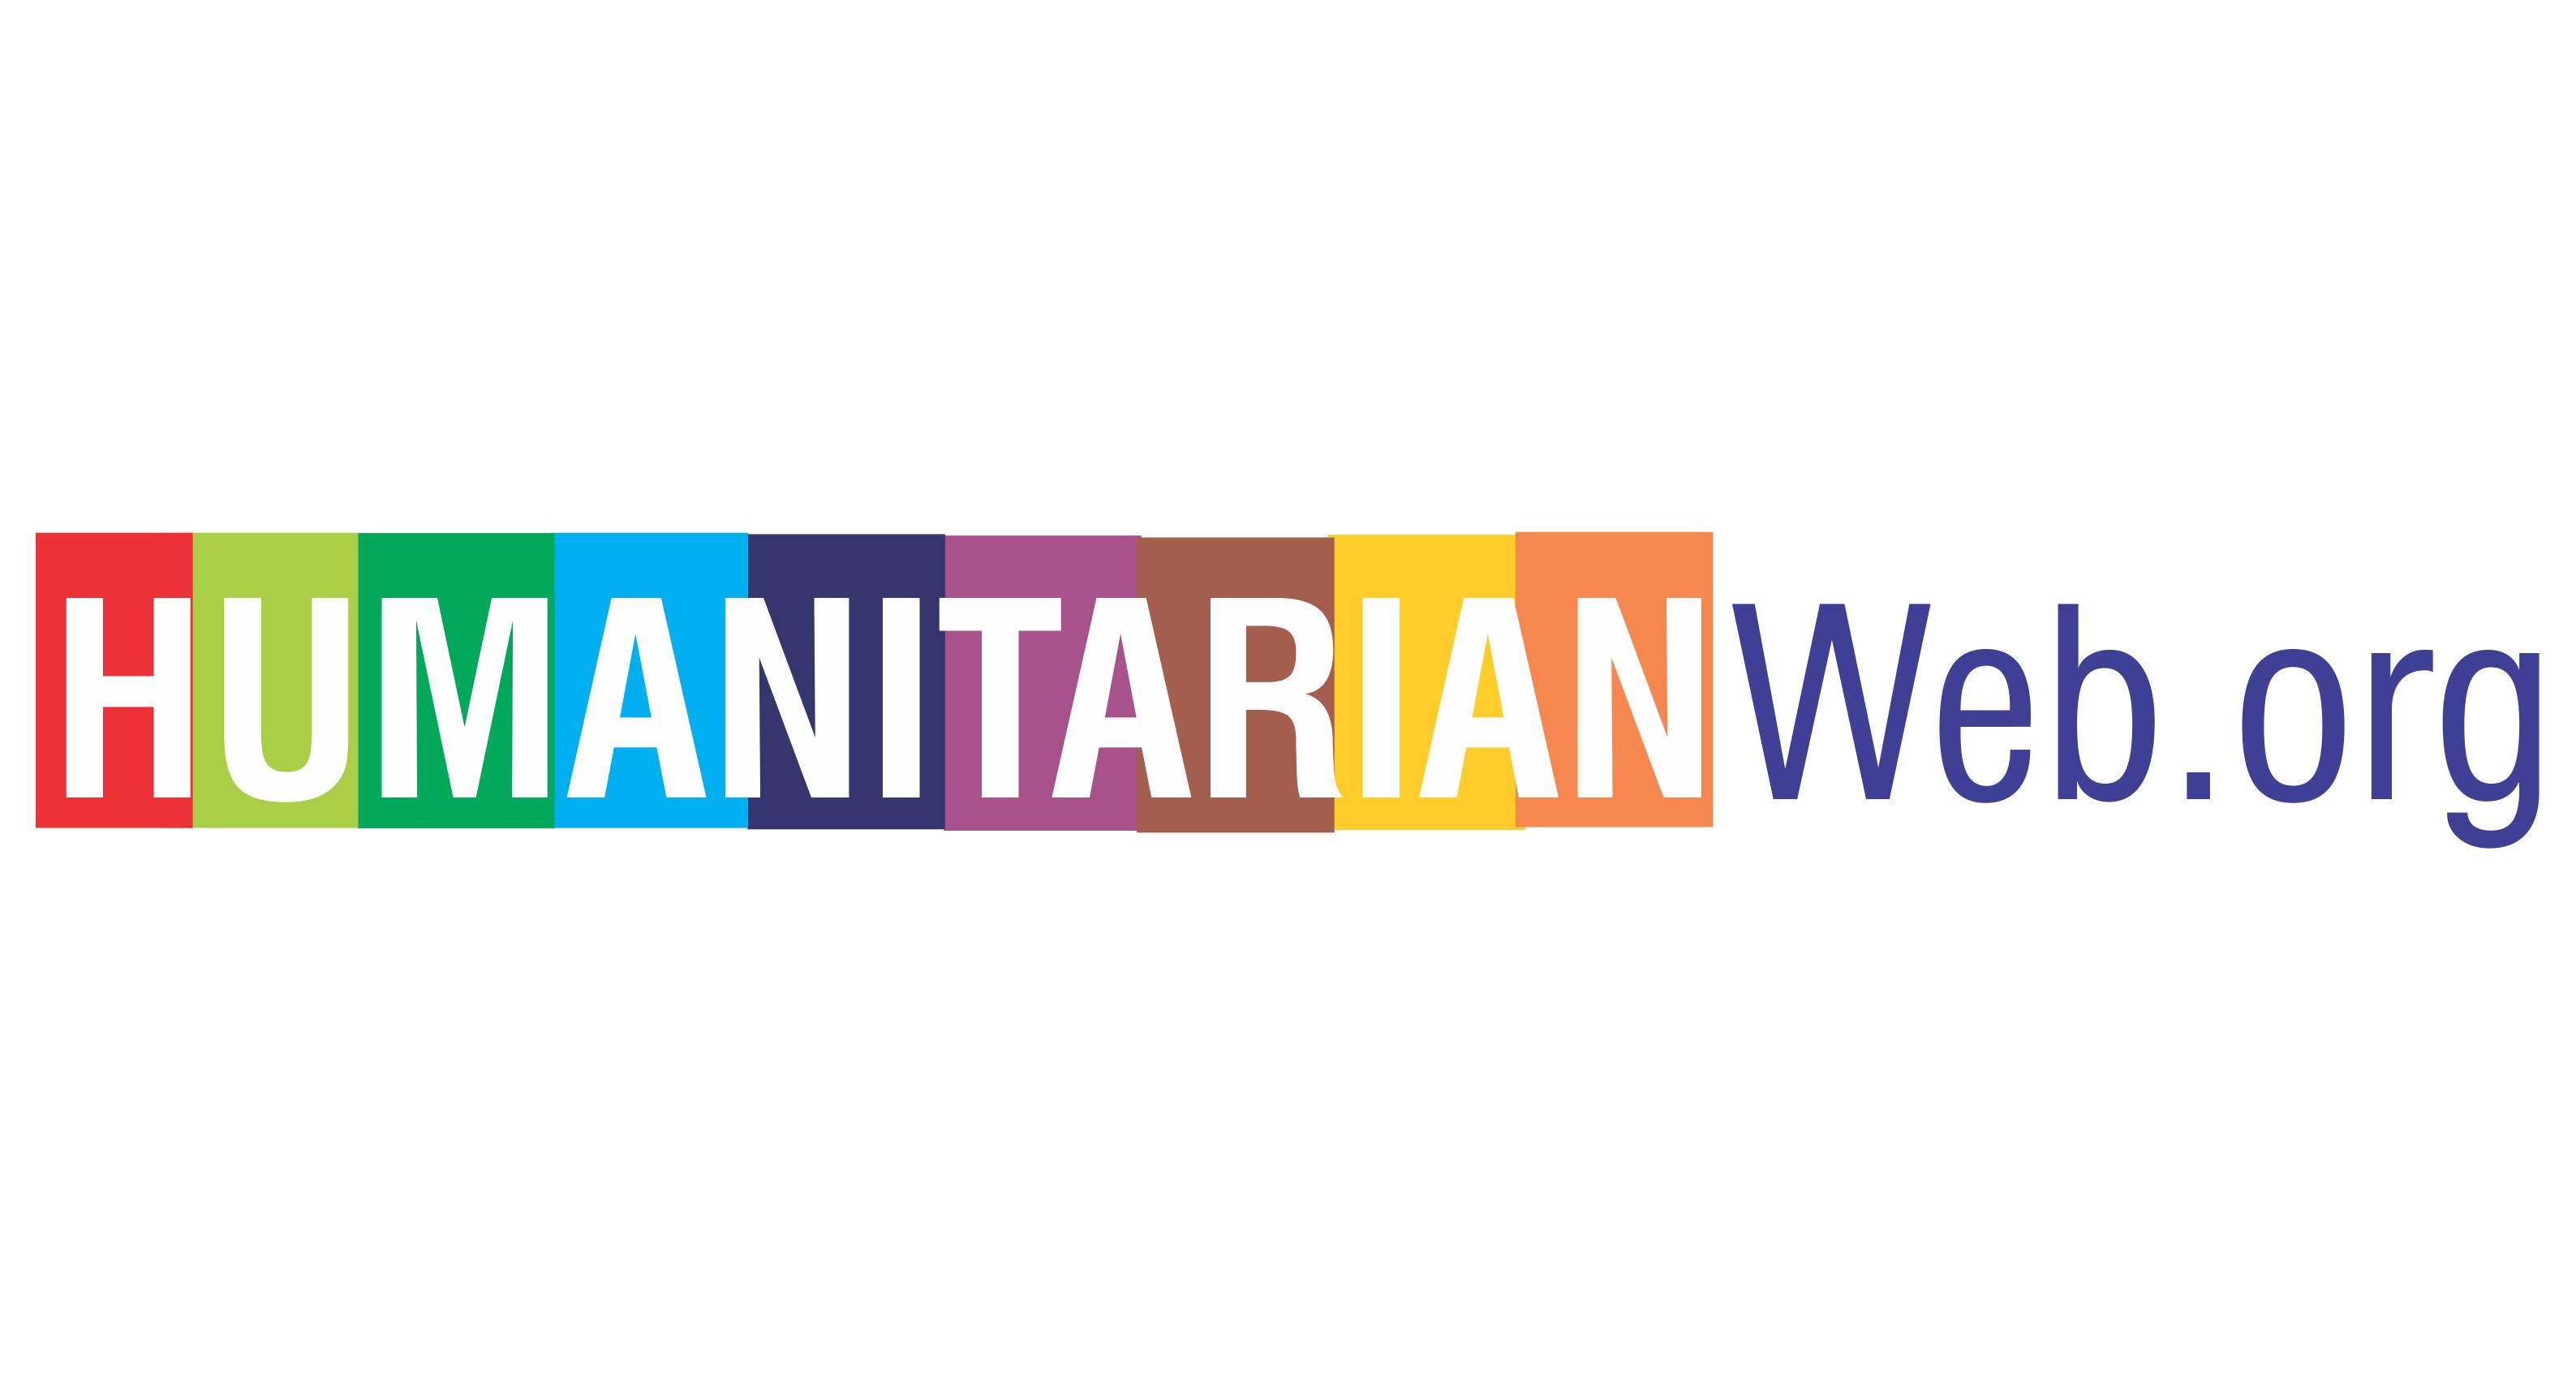 Humanitarianweb